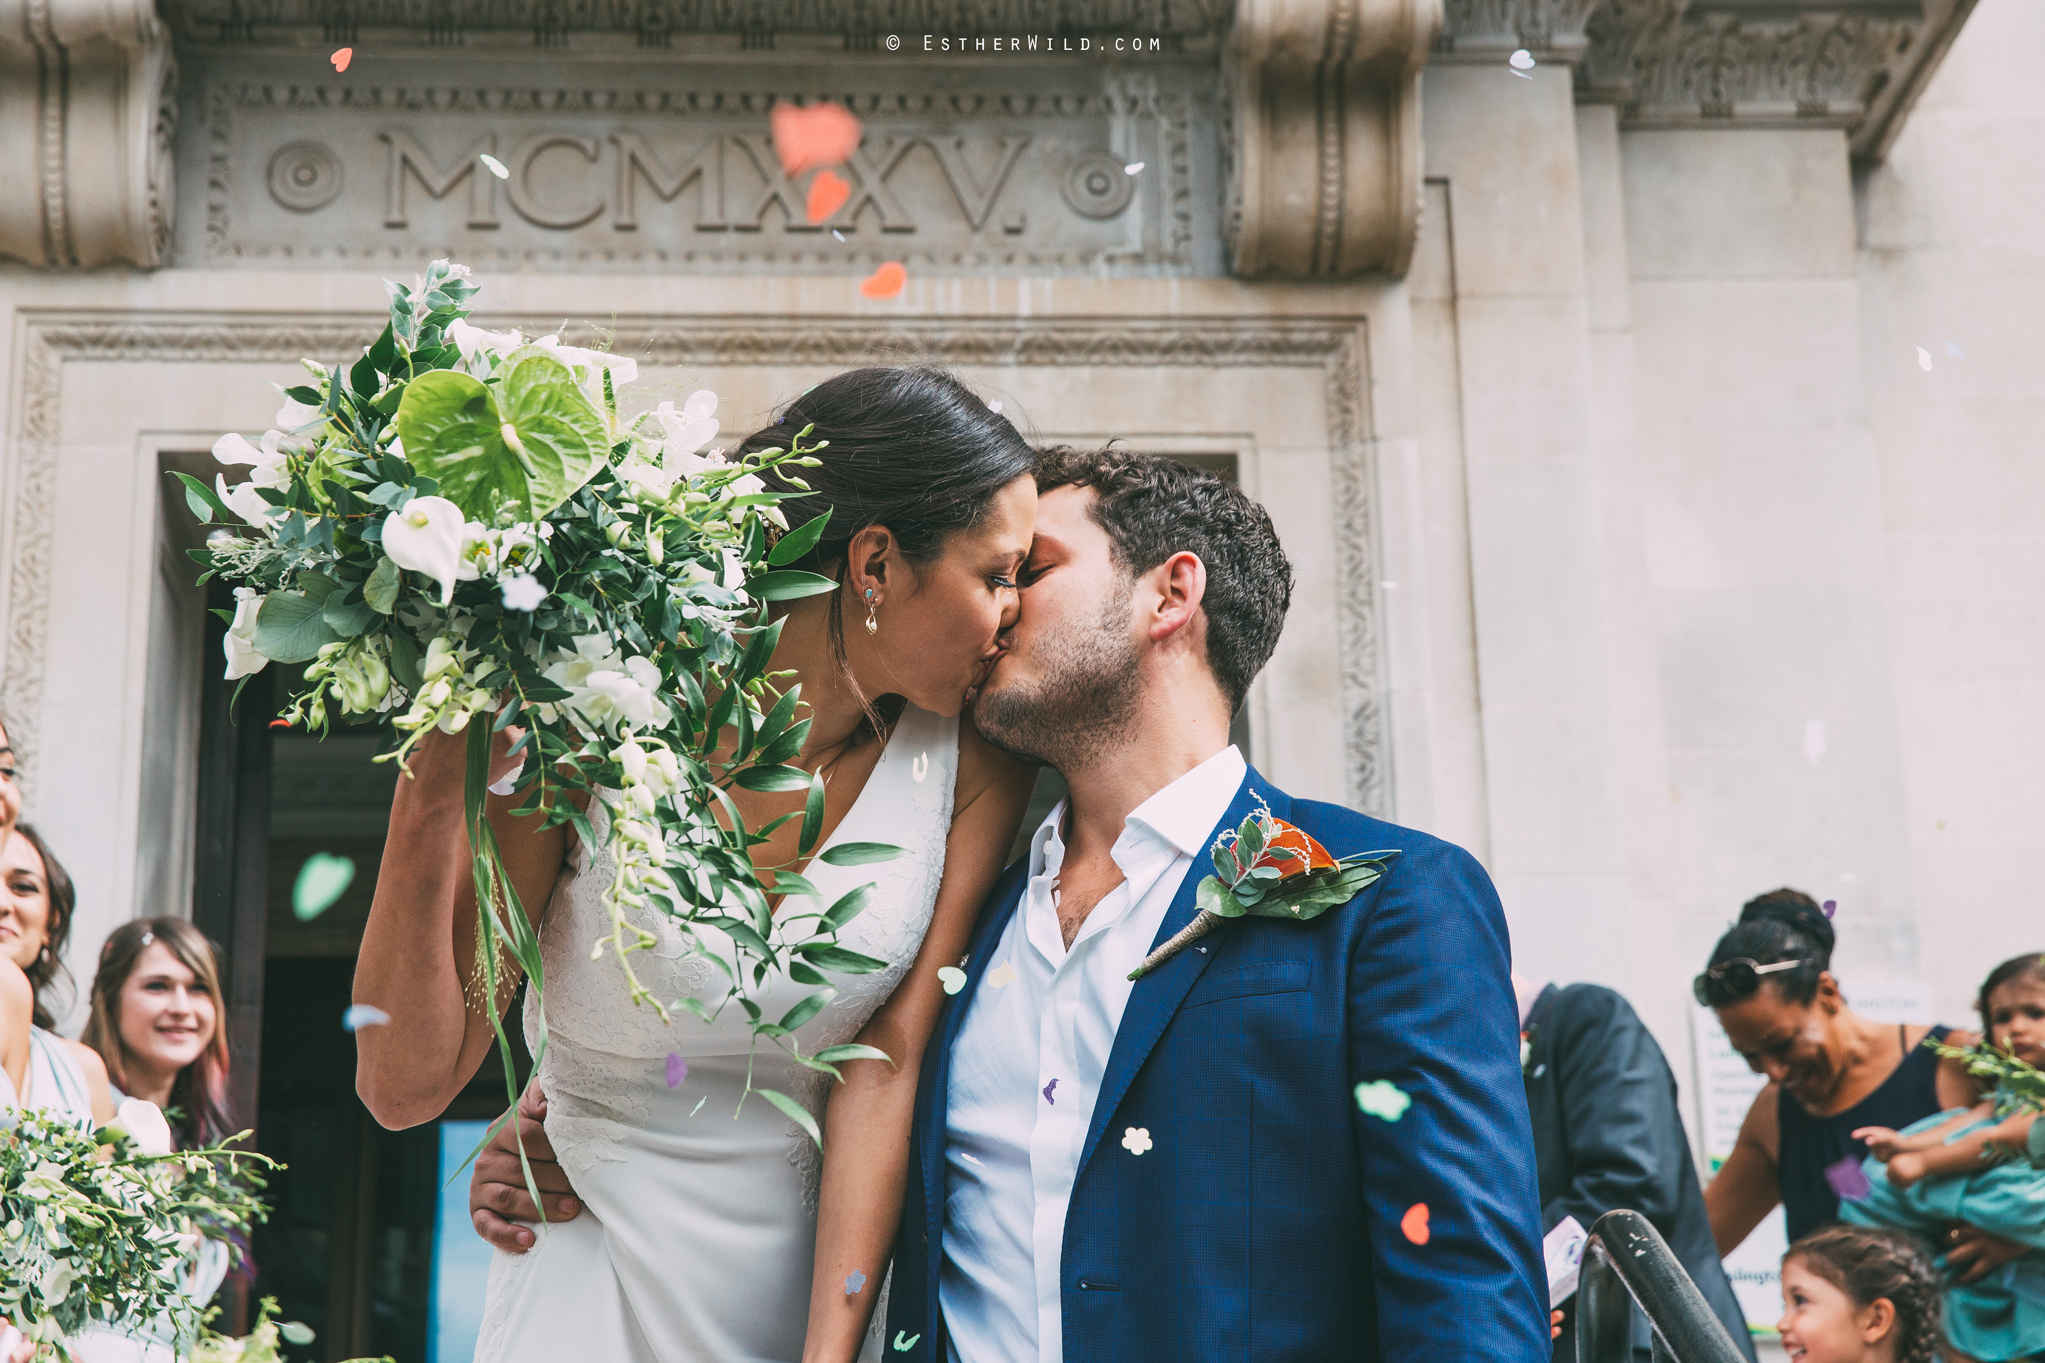 Islington_Town_Hall_Wedding_London_Photographer_Esther_Wild_IMG_5239.jpg